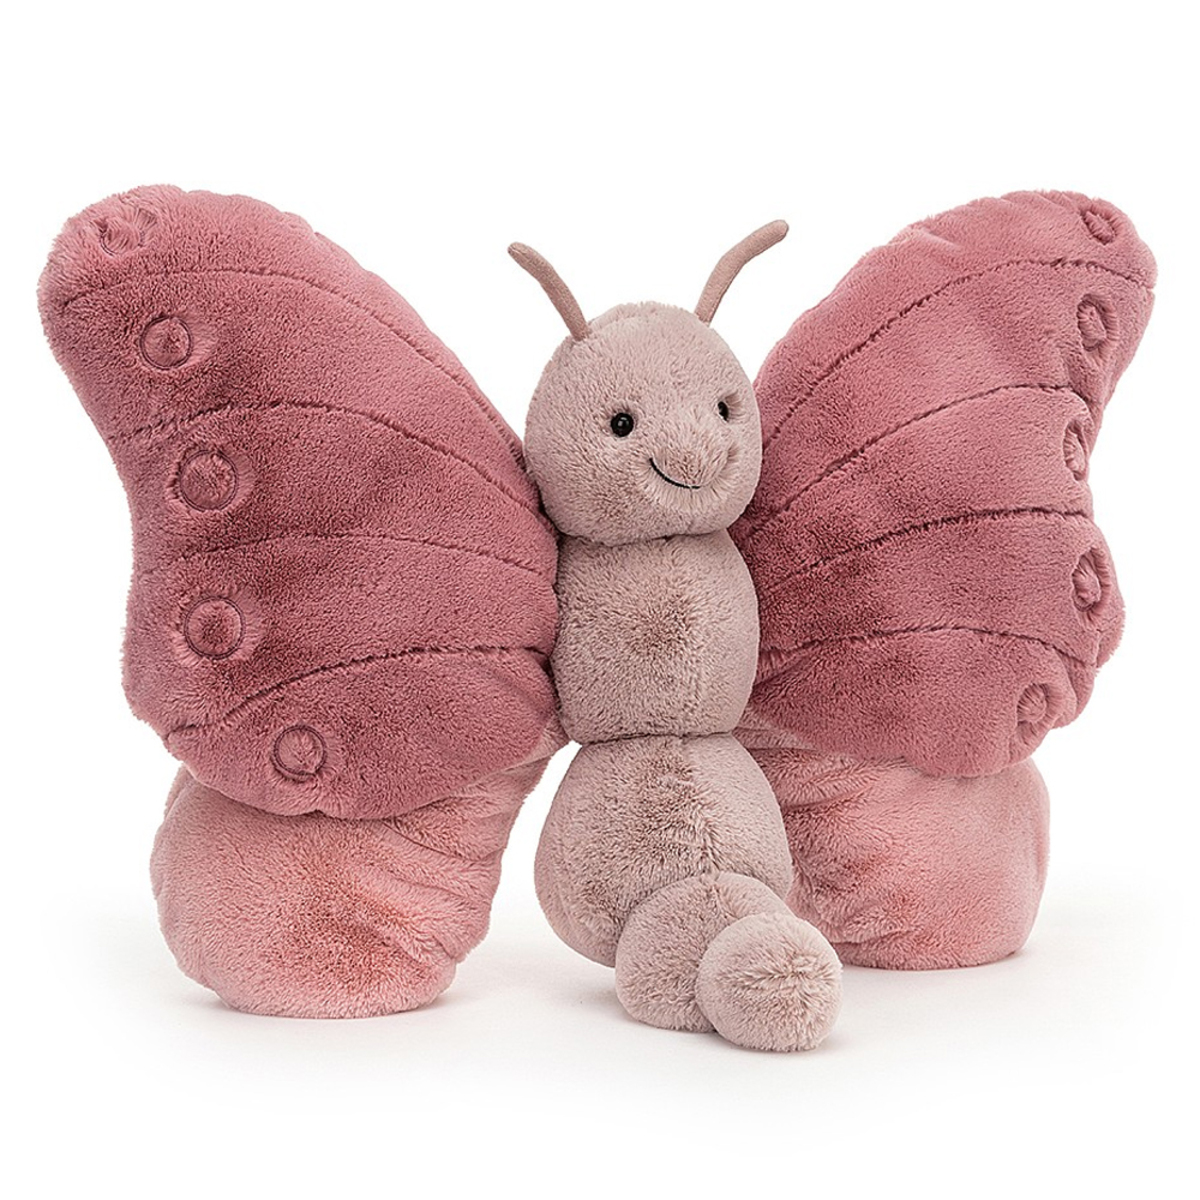 Peluche Beatrice Butterfly - Huge Peluche Papillon 52 cm